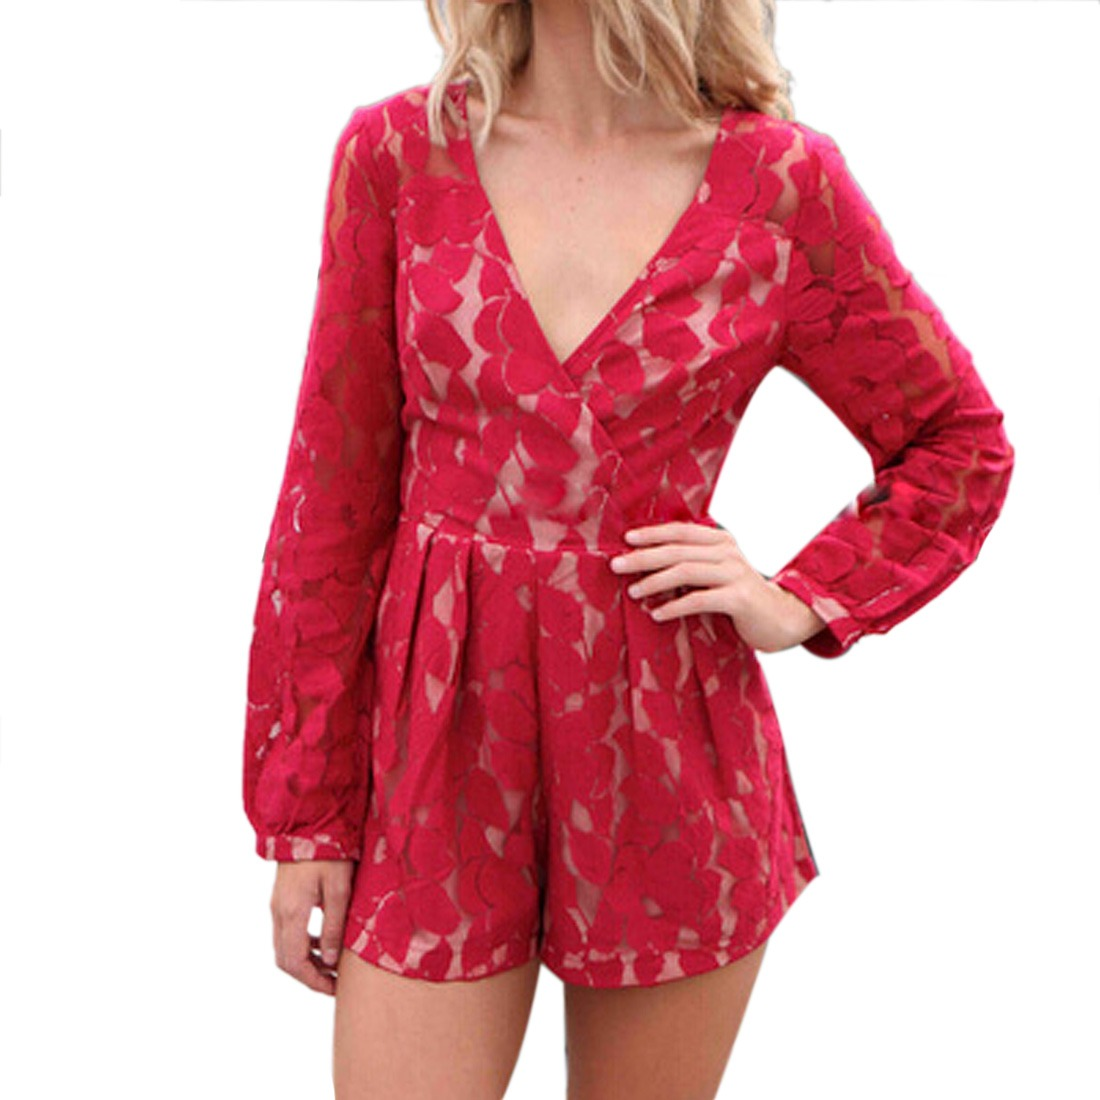 Women long sleeve Deep V Neck Pleat Lace Shorts Romper ...